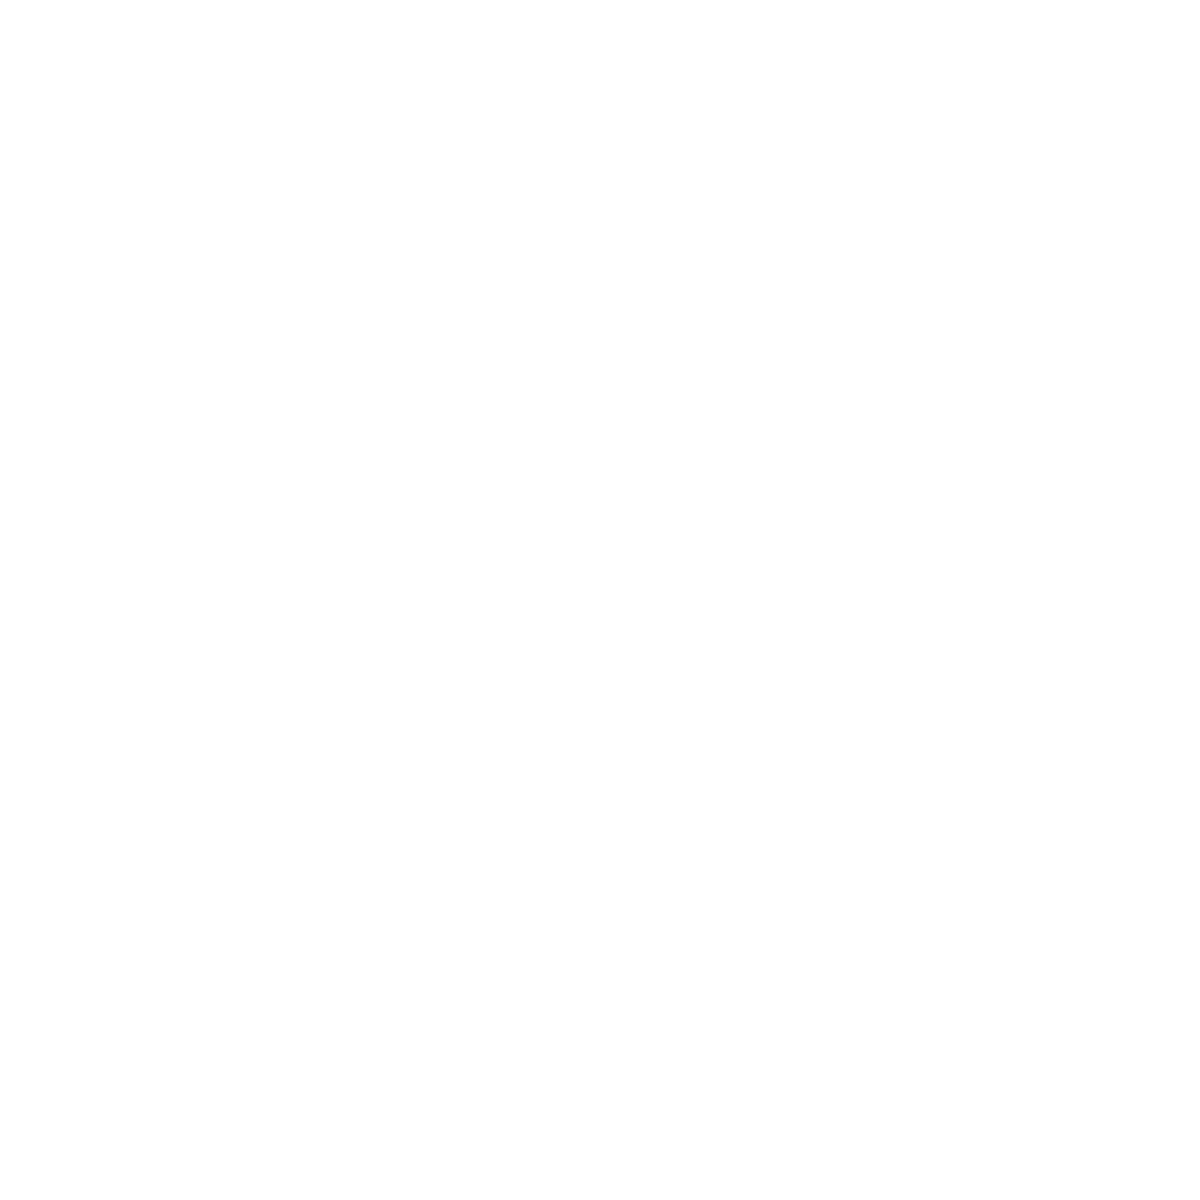 Слитые диана шурыгина icloud фото шурыгина icloud